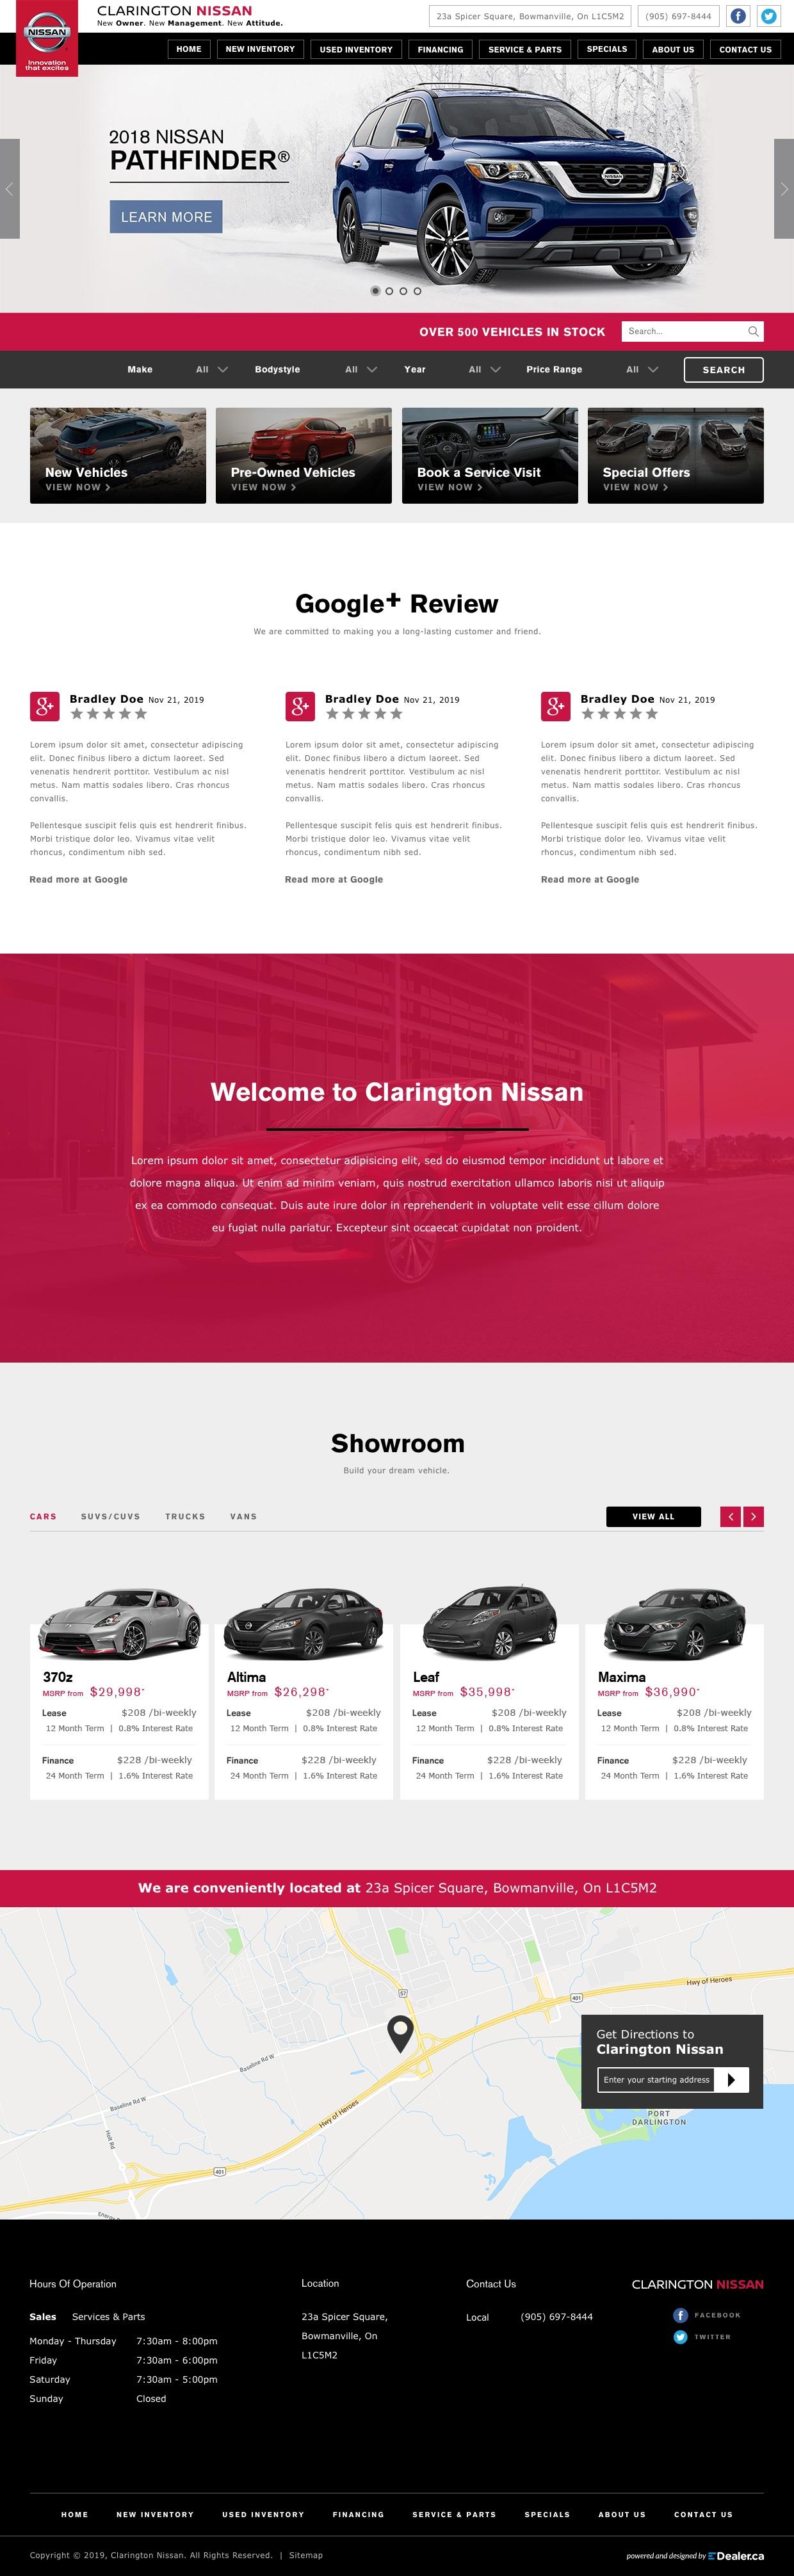 Clarington Nissan